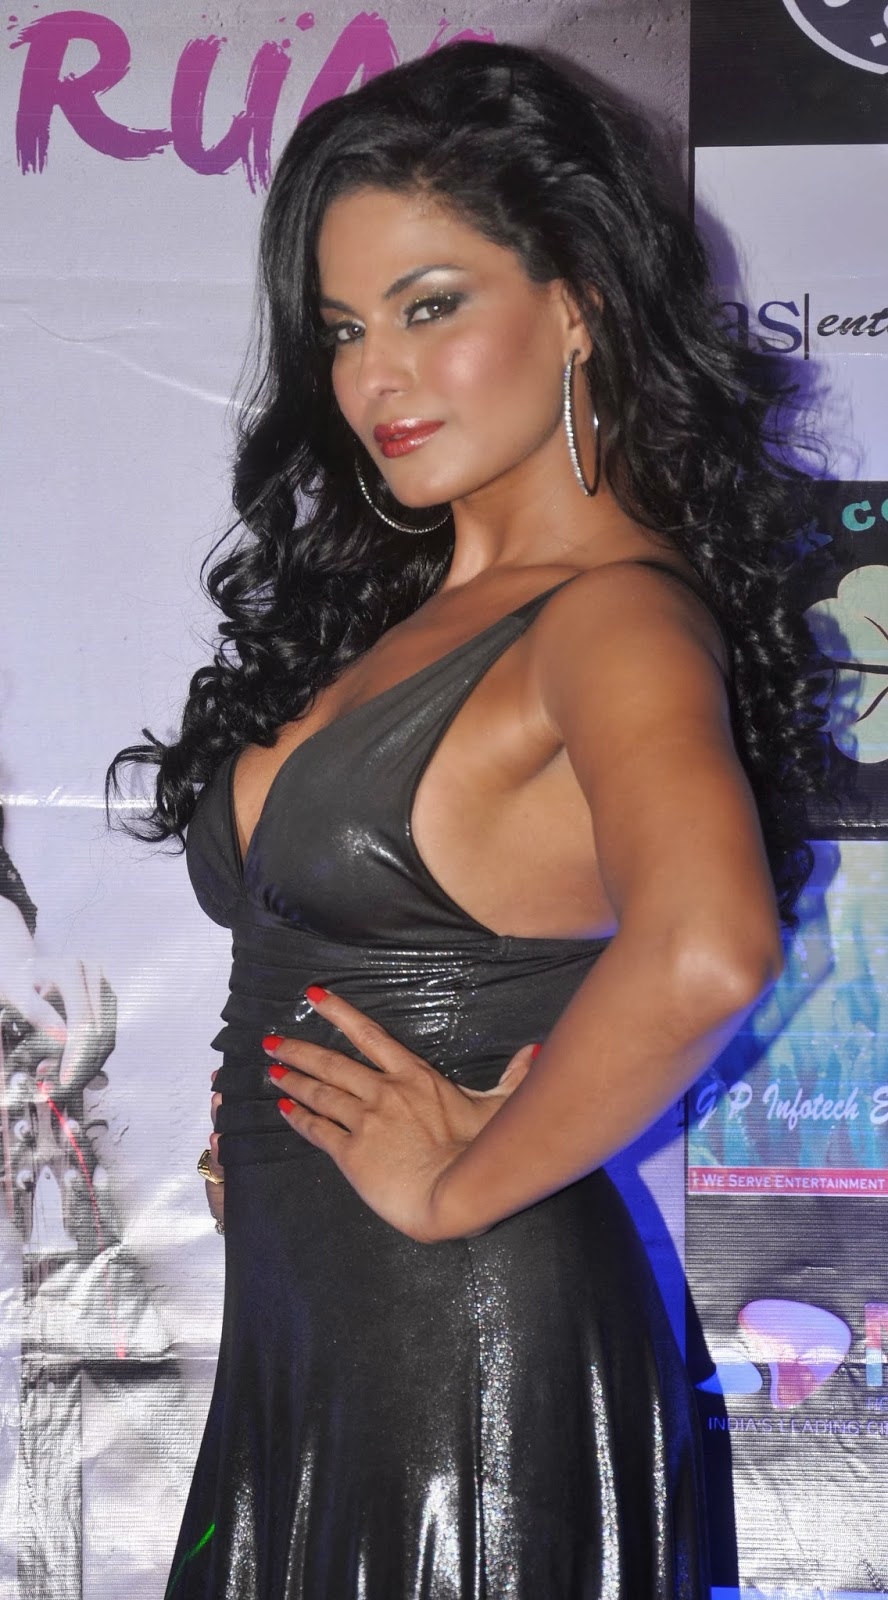 Sexy pics of veena malik